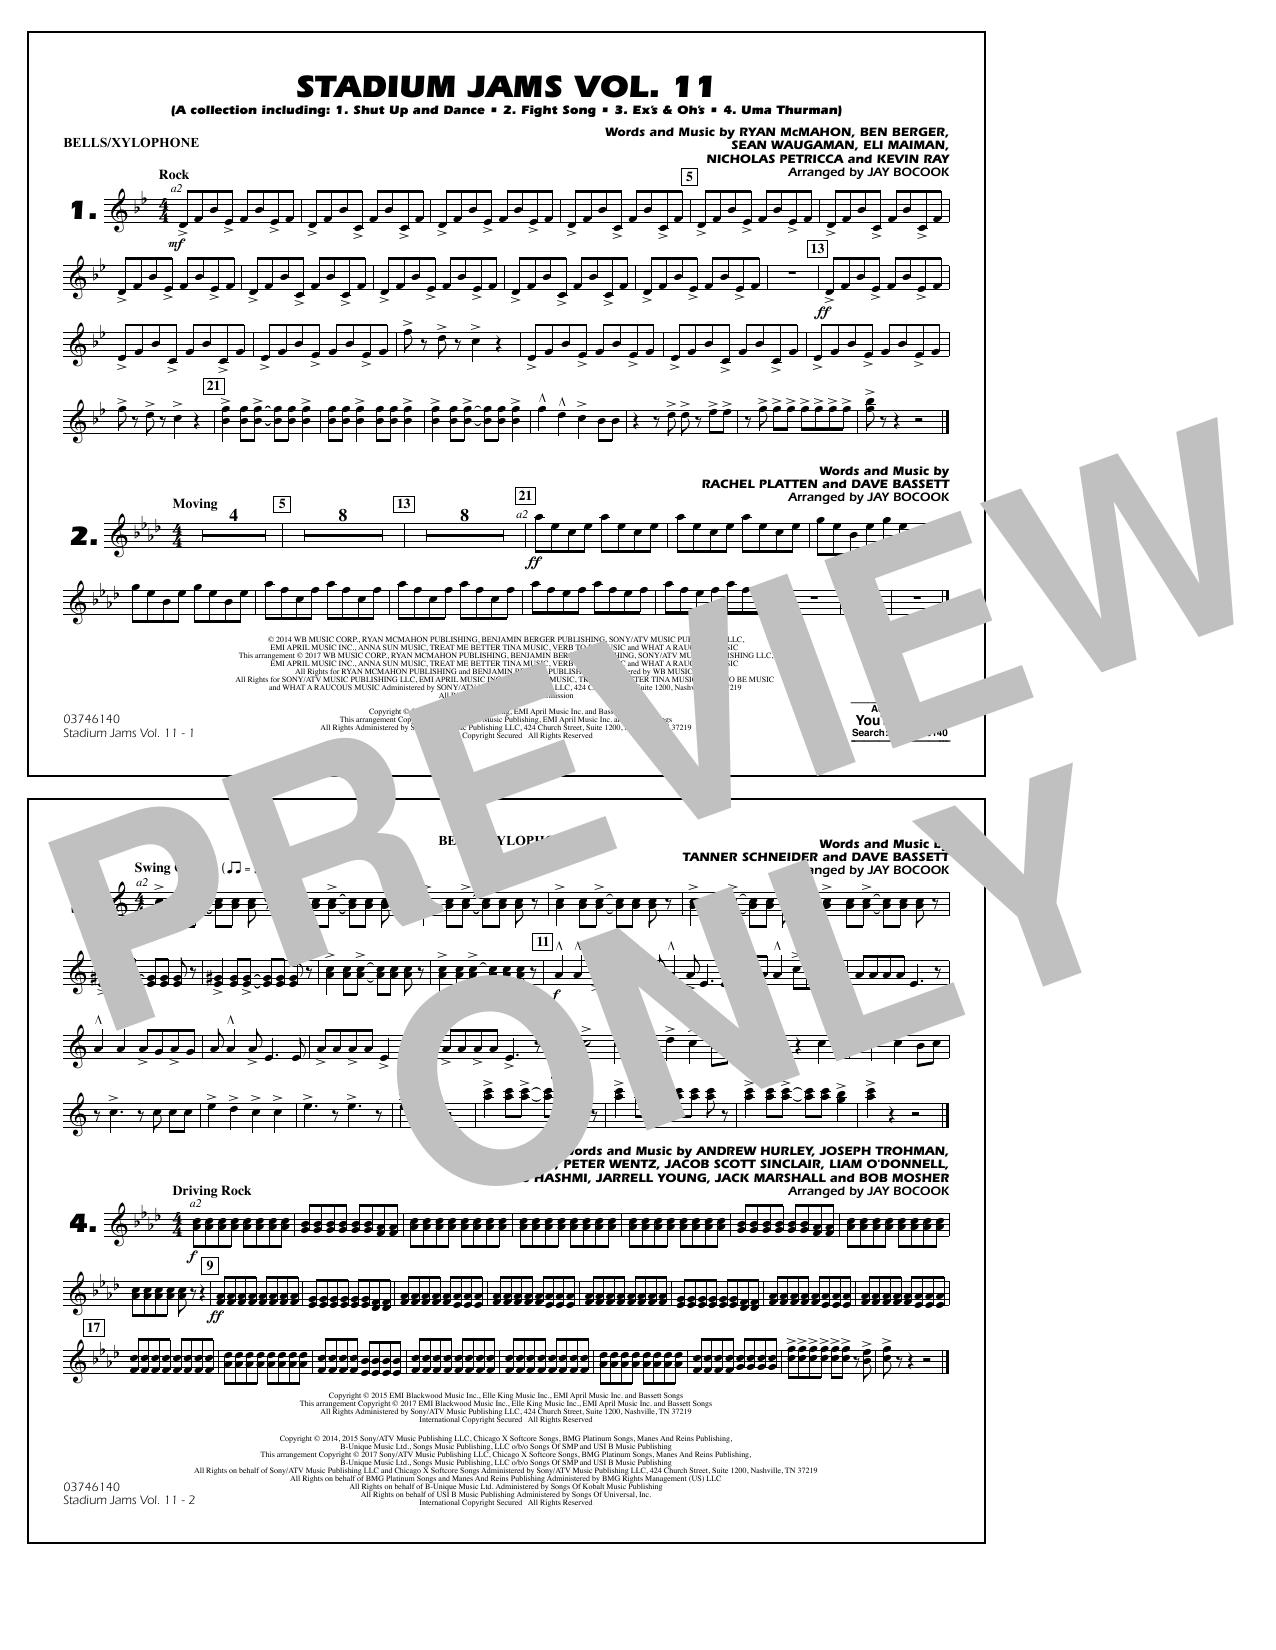 Stadium Jams Volume 11 - Bells/Xylophone Sheet Music